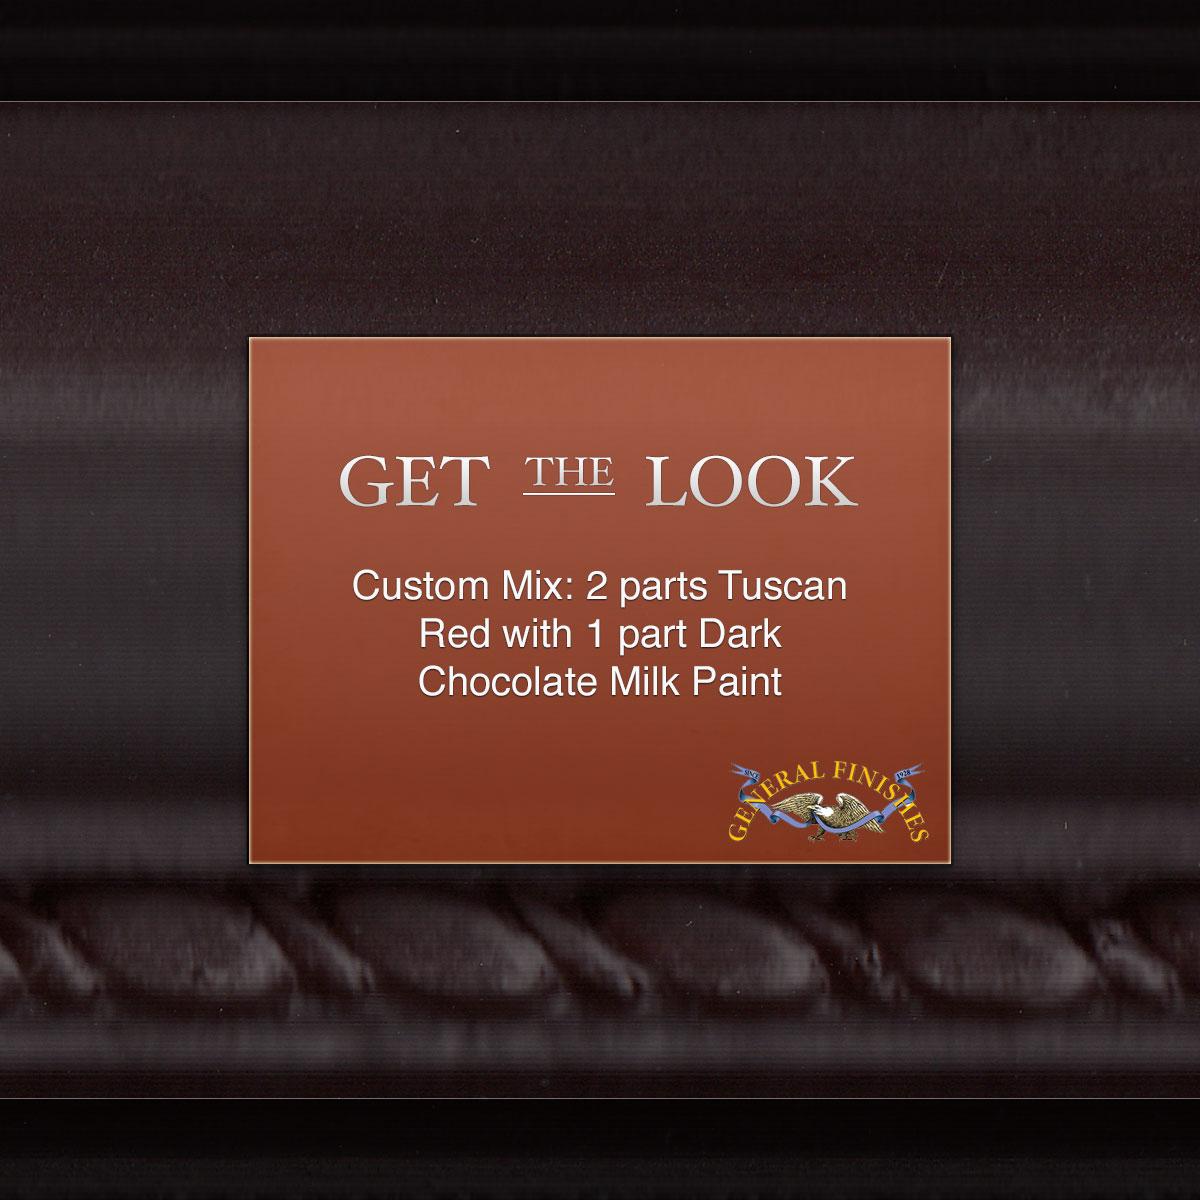 Get The Look Custom Mix Tuscan Red Amp Dark Chocolate Milk